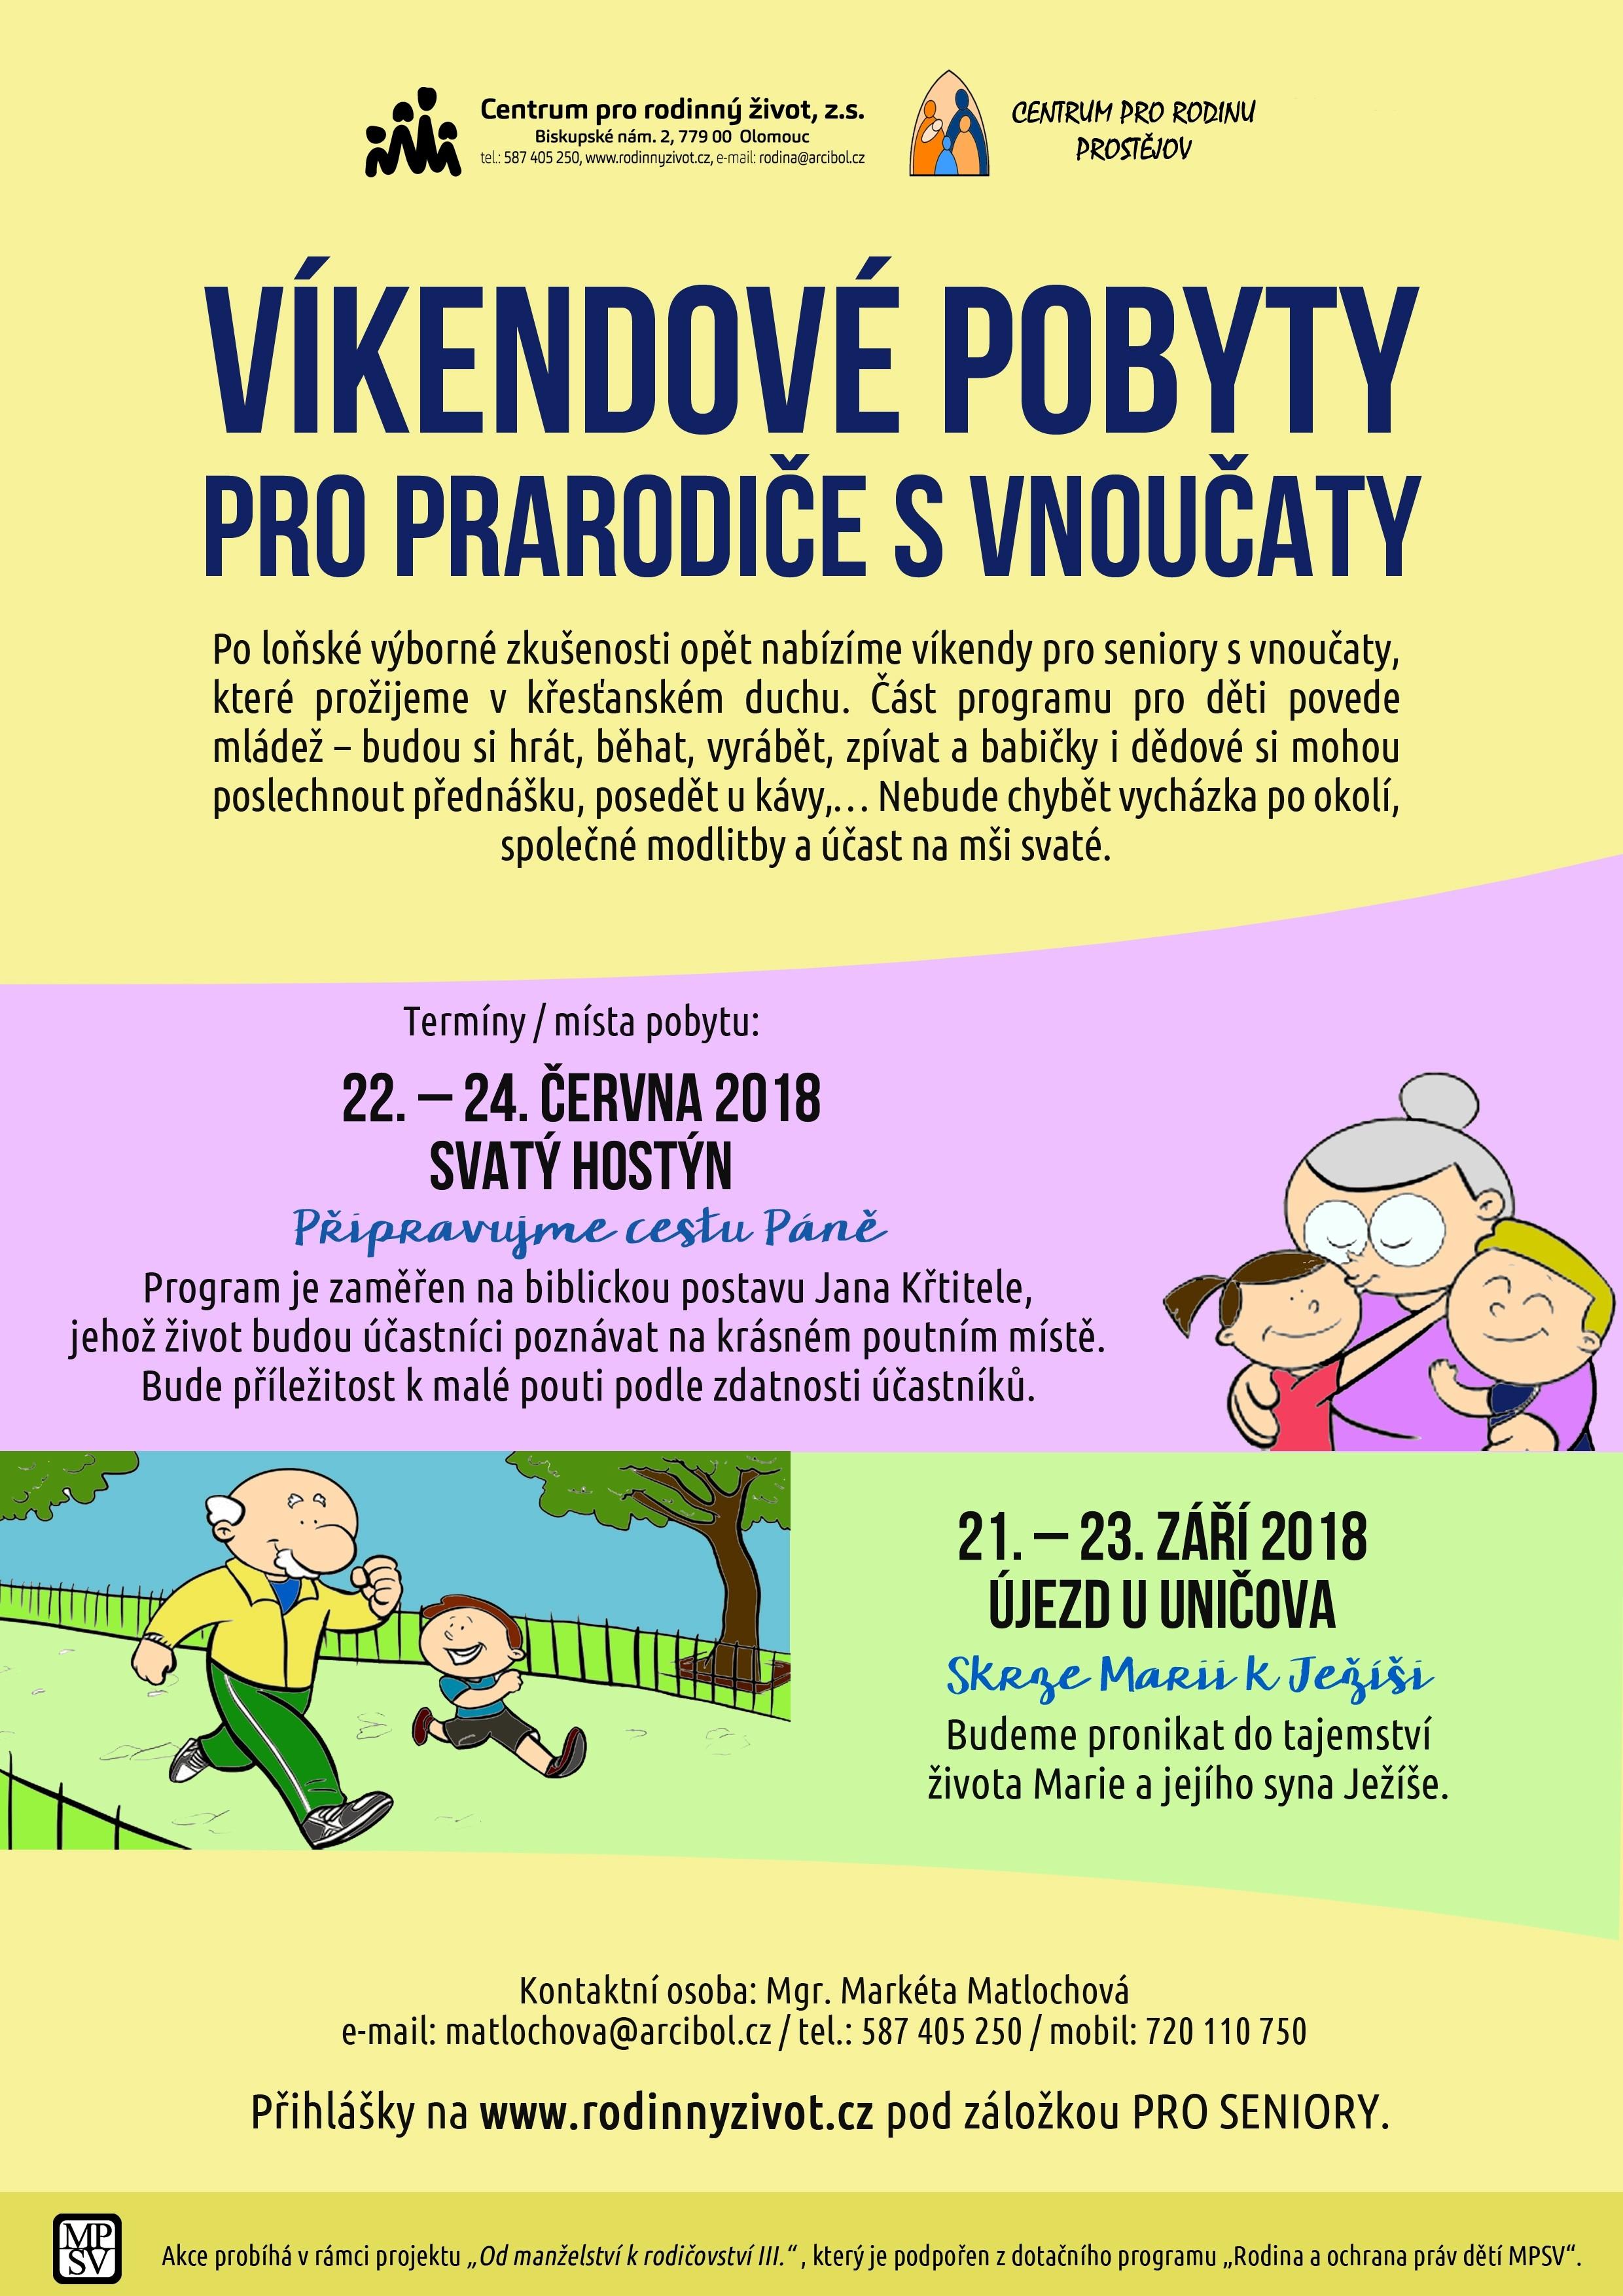 PLAK-vikendy pro prarodice s vnoucaty CPRZ OL-a-CPR PV